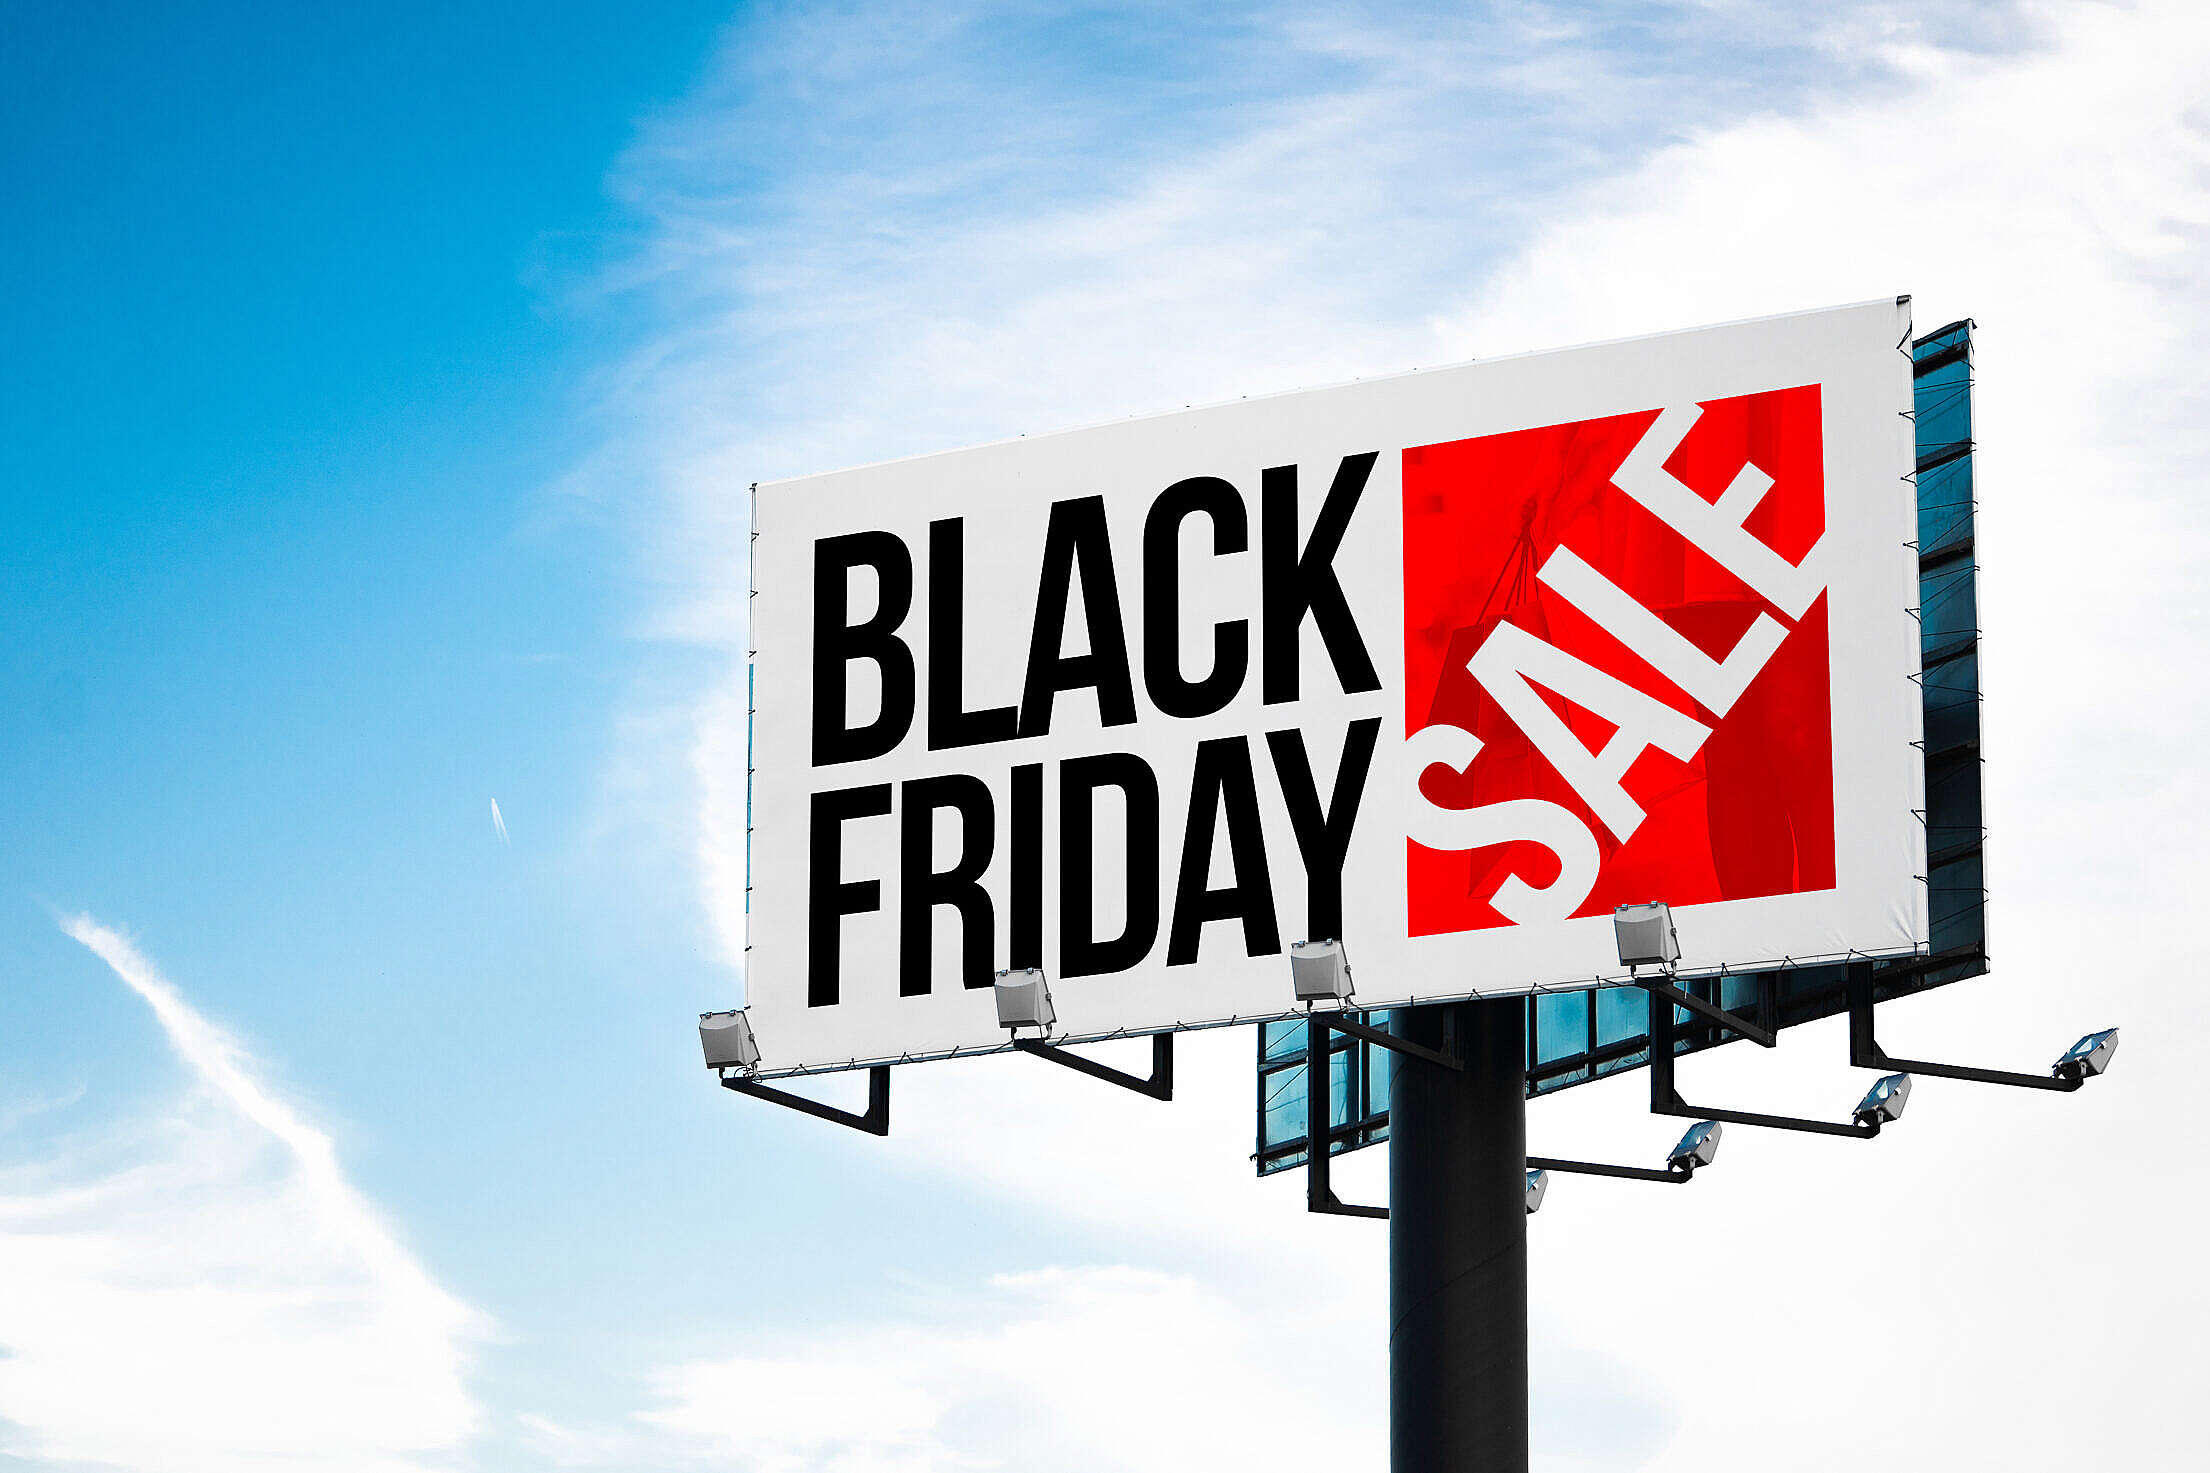 Black Friday Shopping Sale Billboard Free Stock Photo